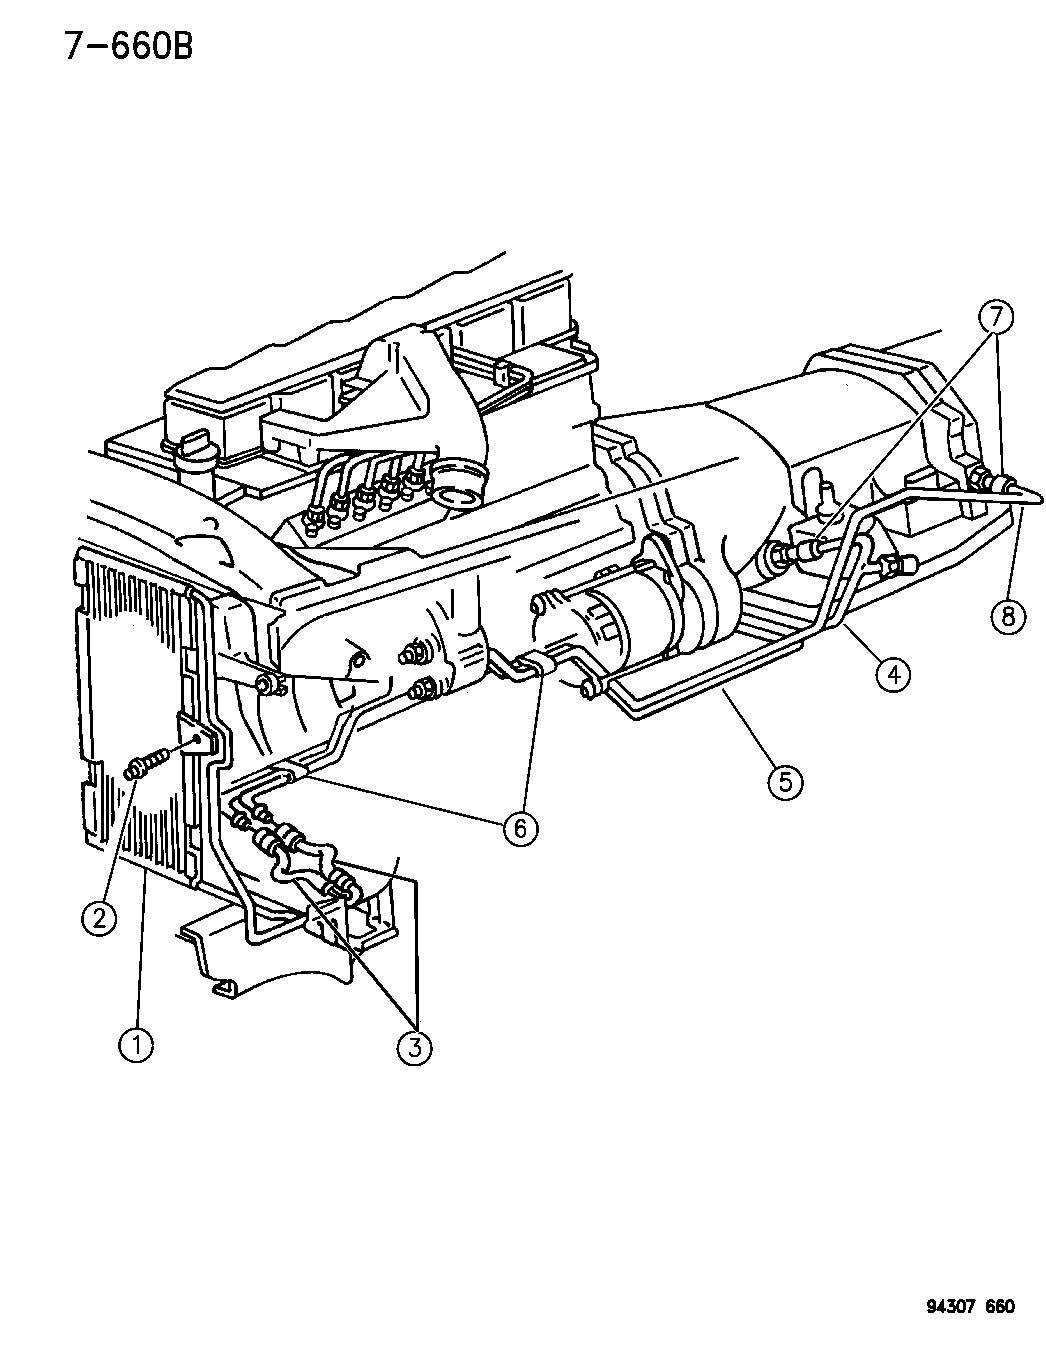 1996 Dodge Oil Cooler And Lines Diesel Engine R Body